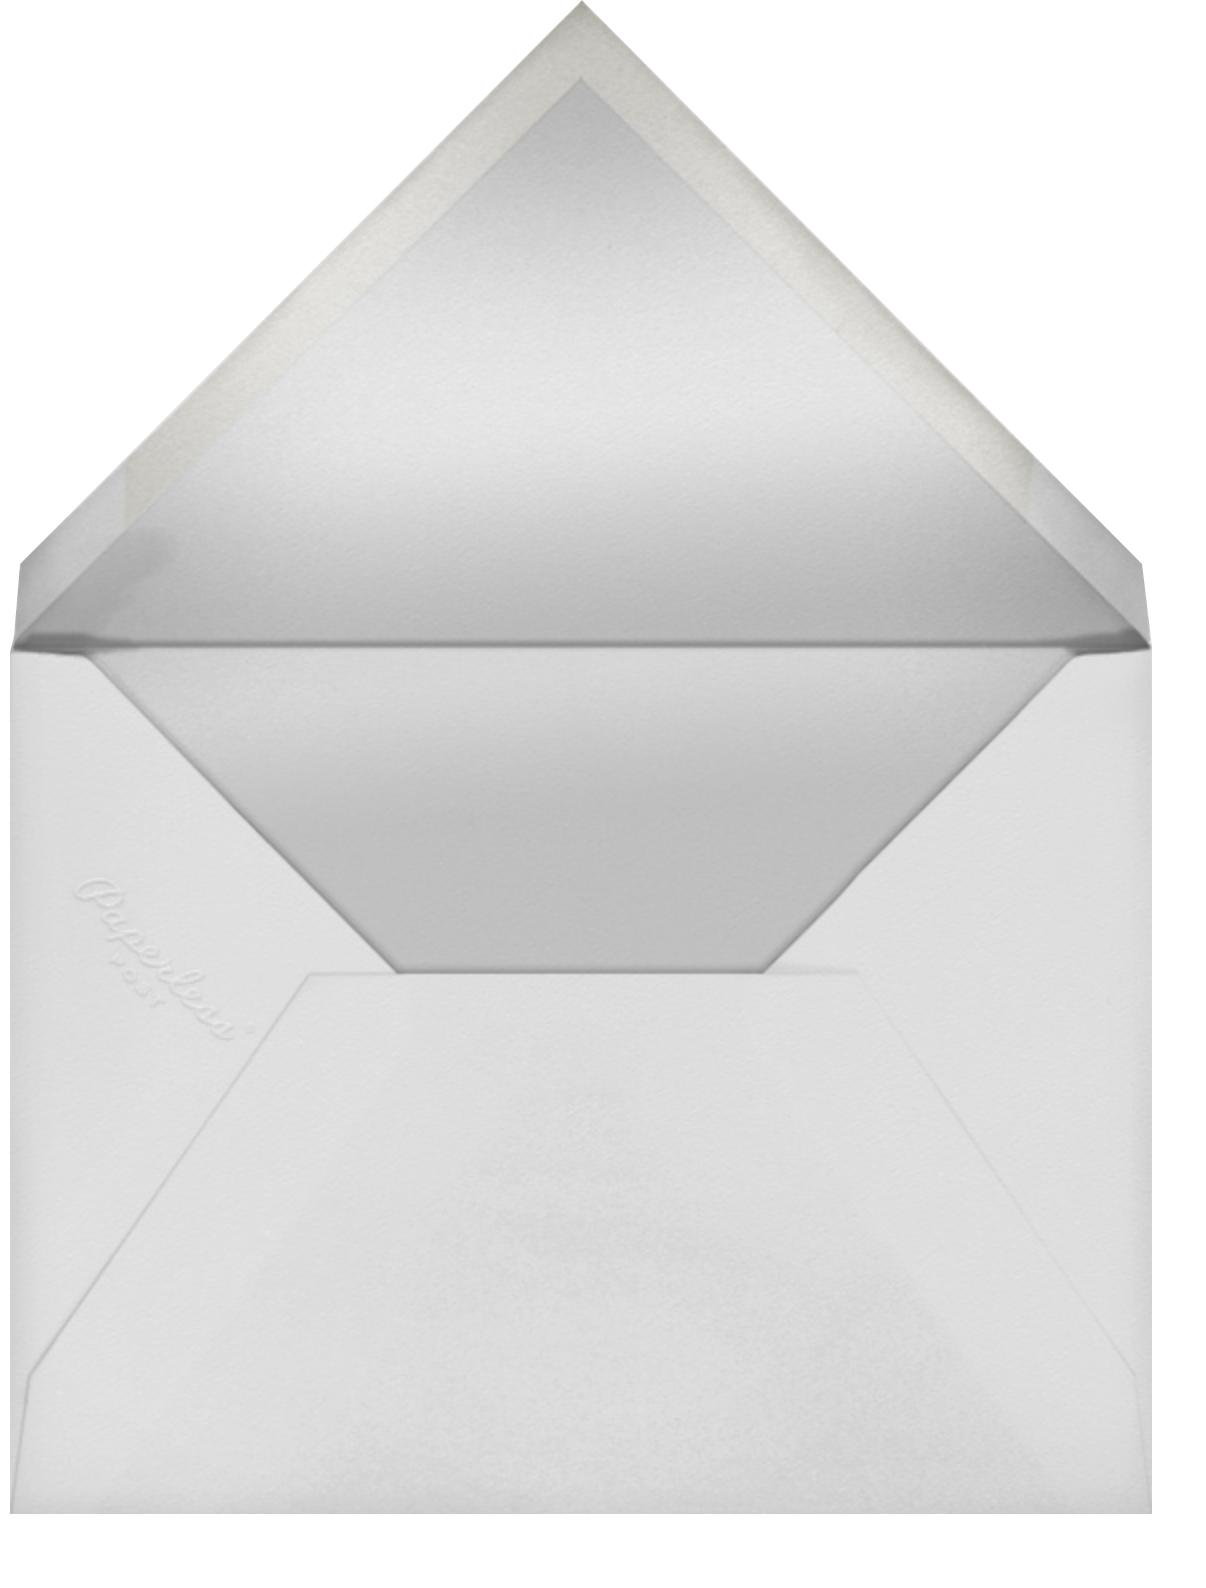 Mr. Digby (Menu)  - Mr. Boddington's Studio - Menus - envelope back